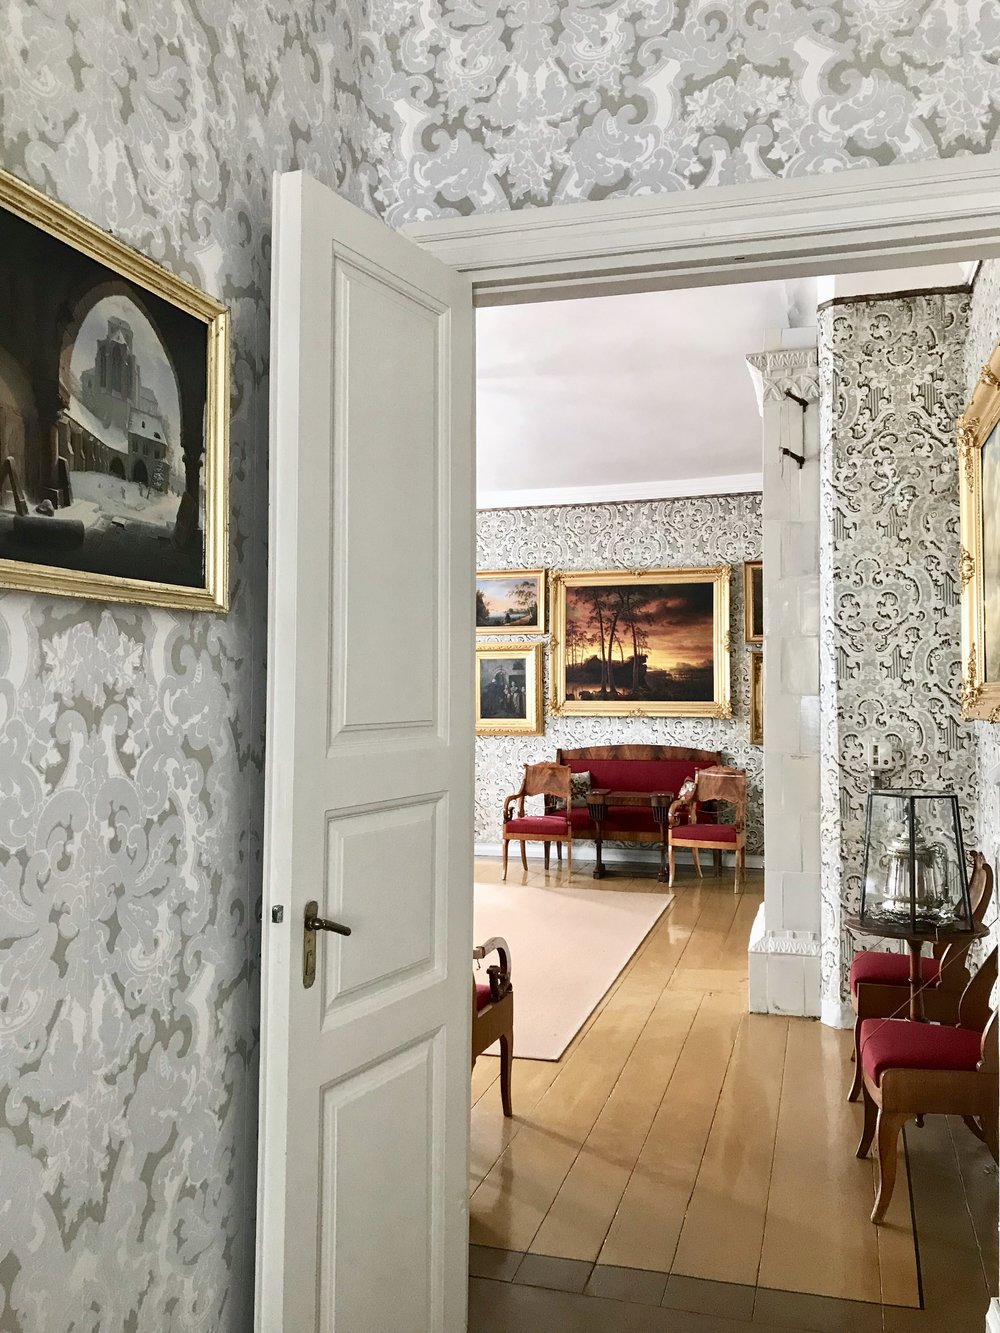 Runebergin koti